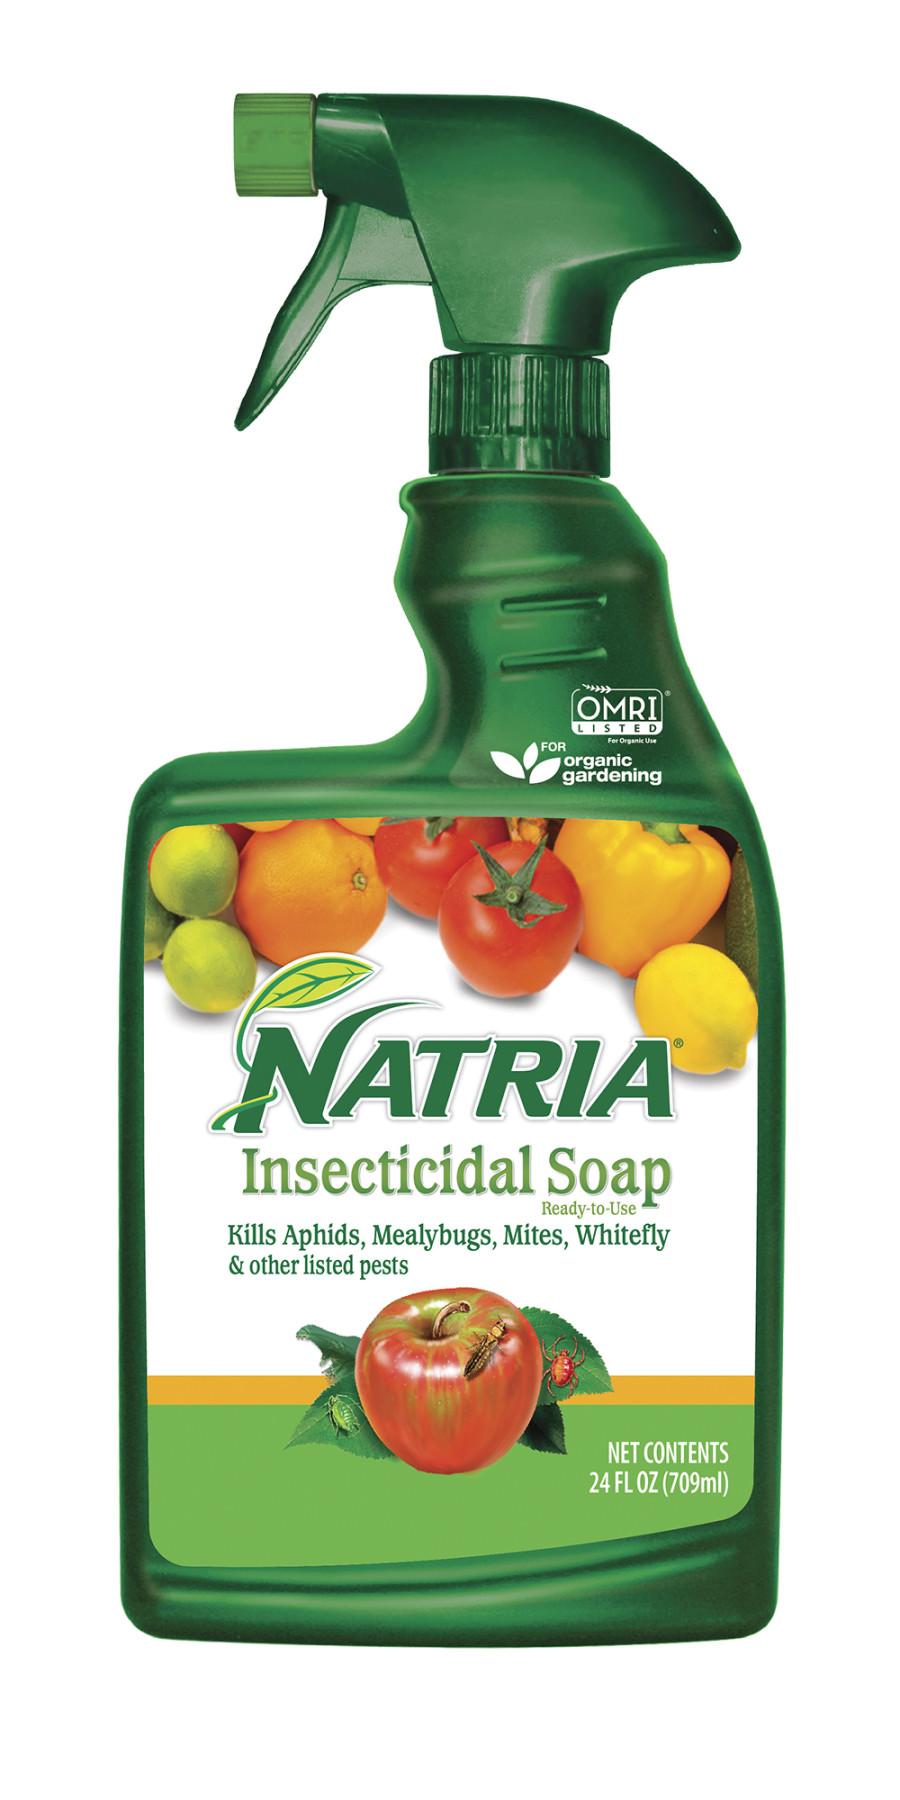 BioAdvanced Natria Insecticidal Soap Ready to Use Organic 8ea/24 fl oz